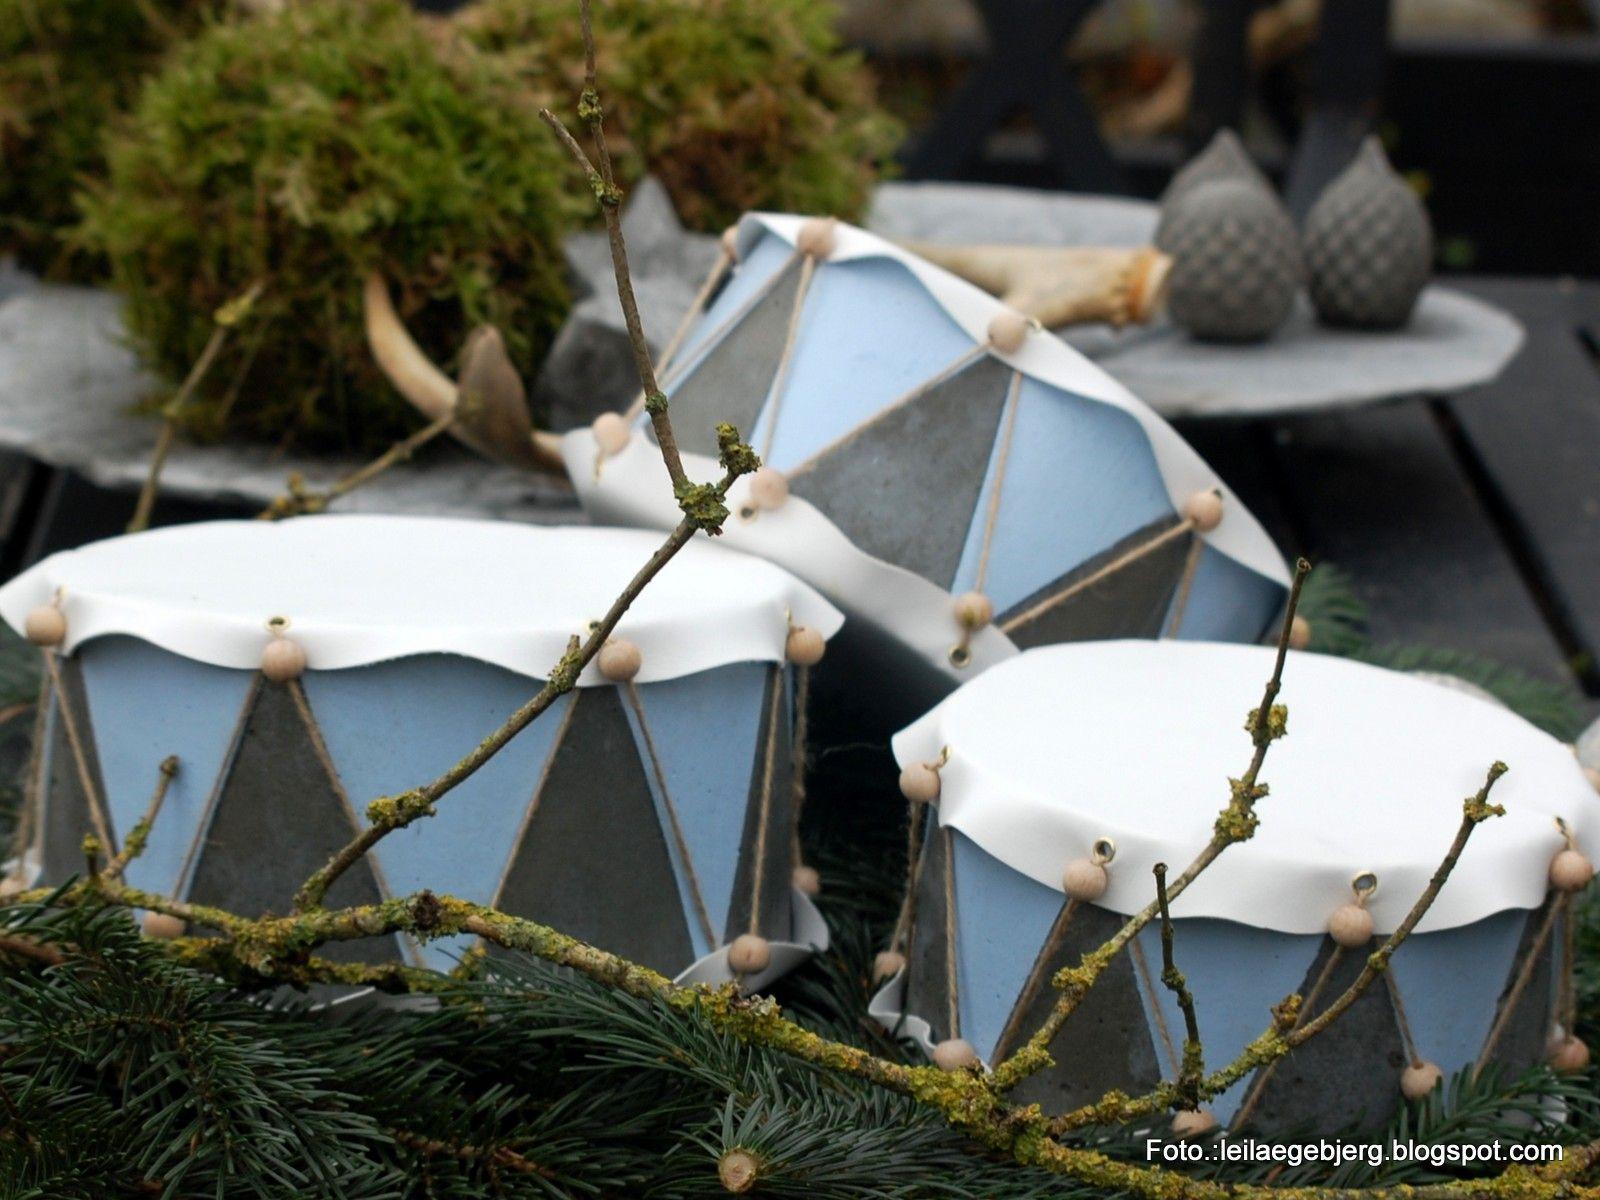 min blog handler om haven, beton-støbning, kreativ husflid